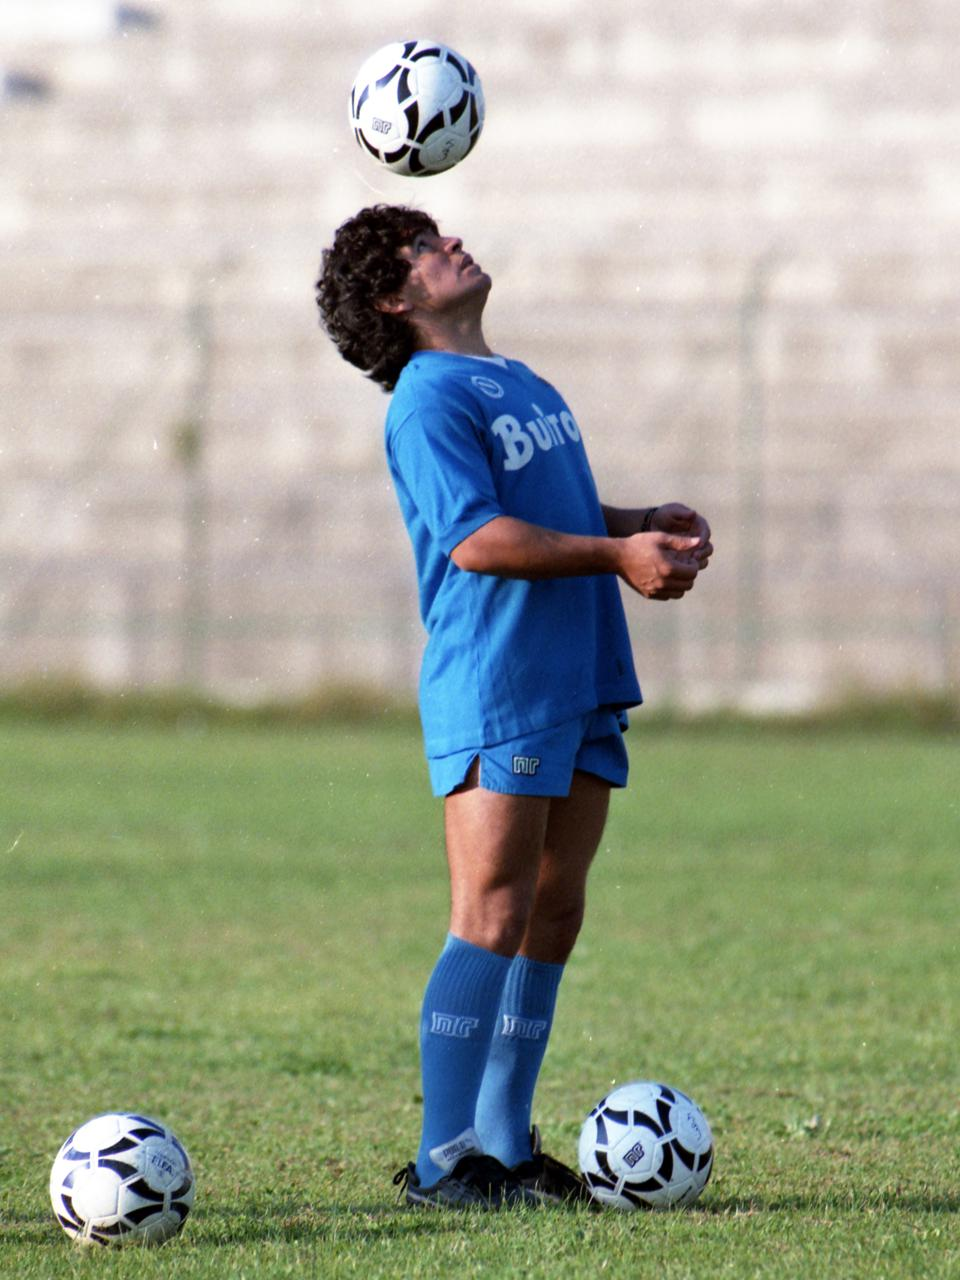 Napoli Training Session